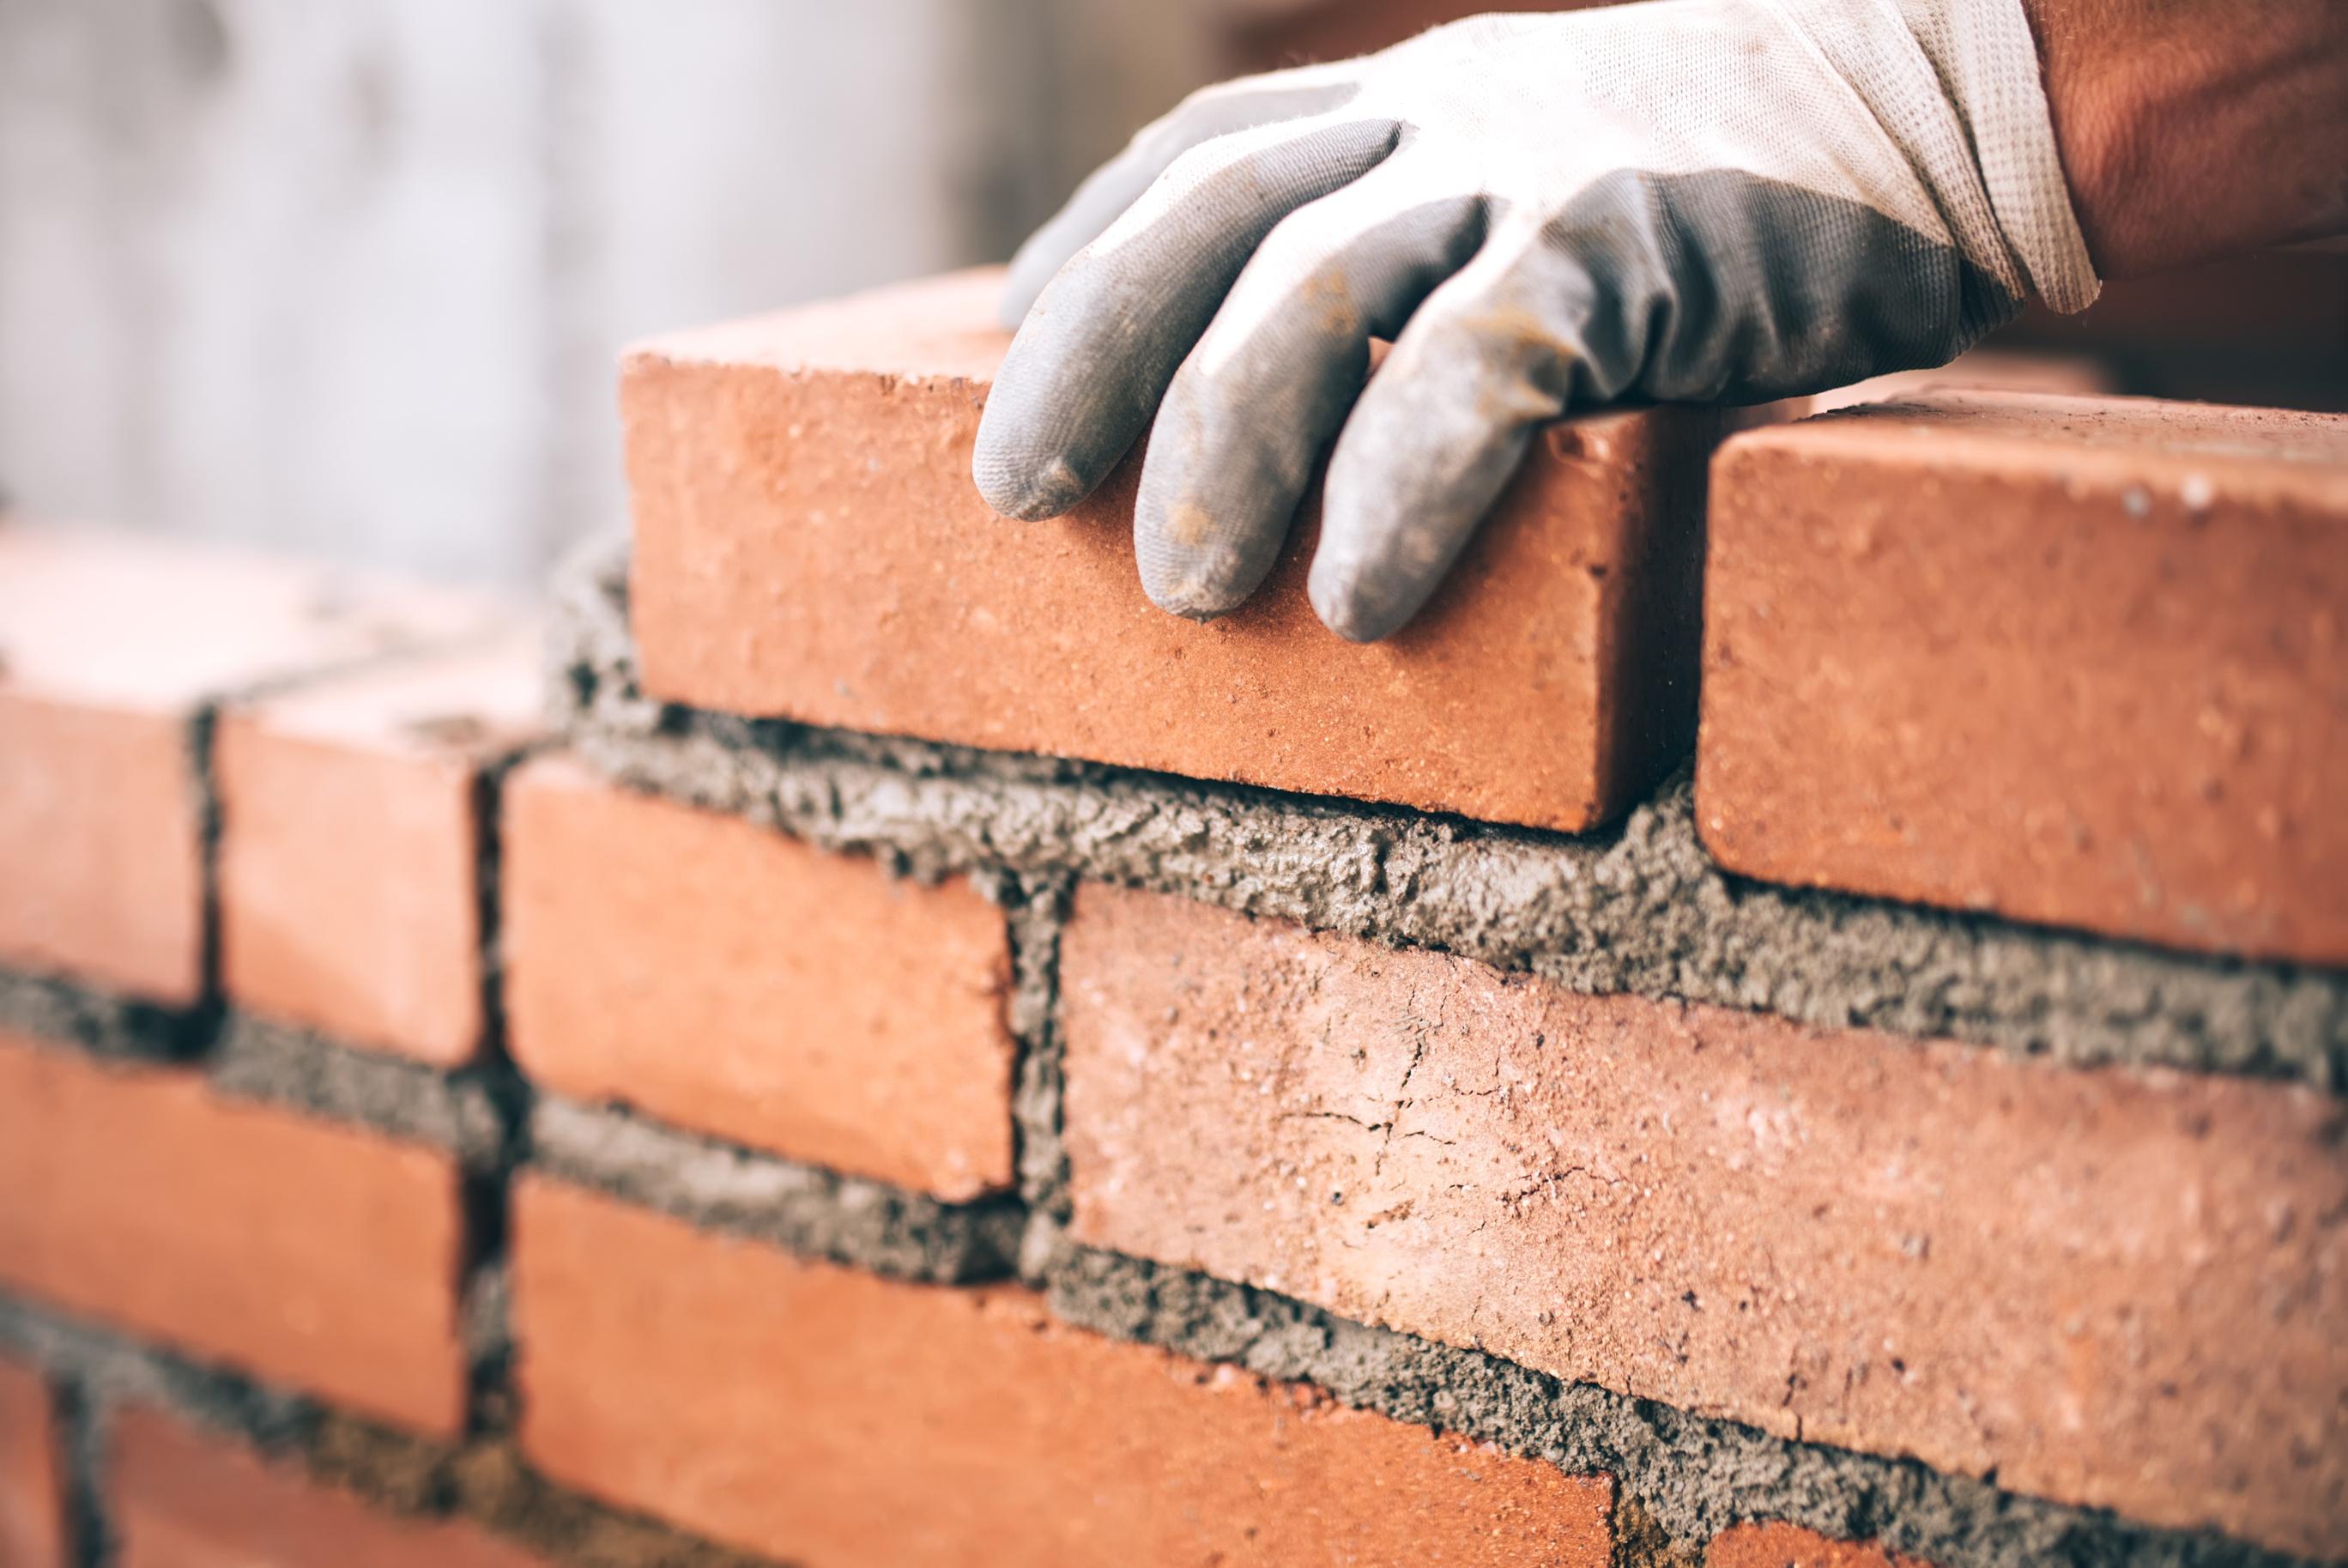 industrial-bricklayer-installing-bricks-on-construction-site-75236615